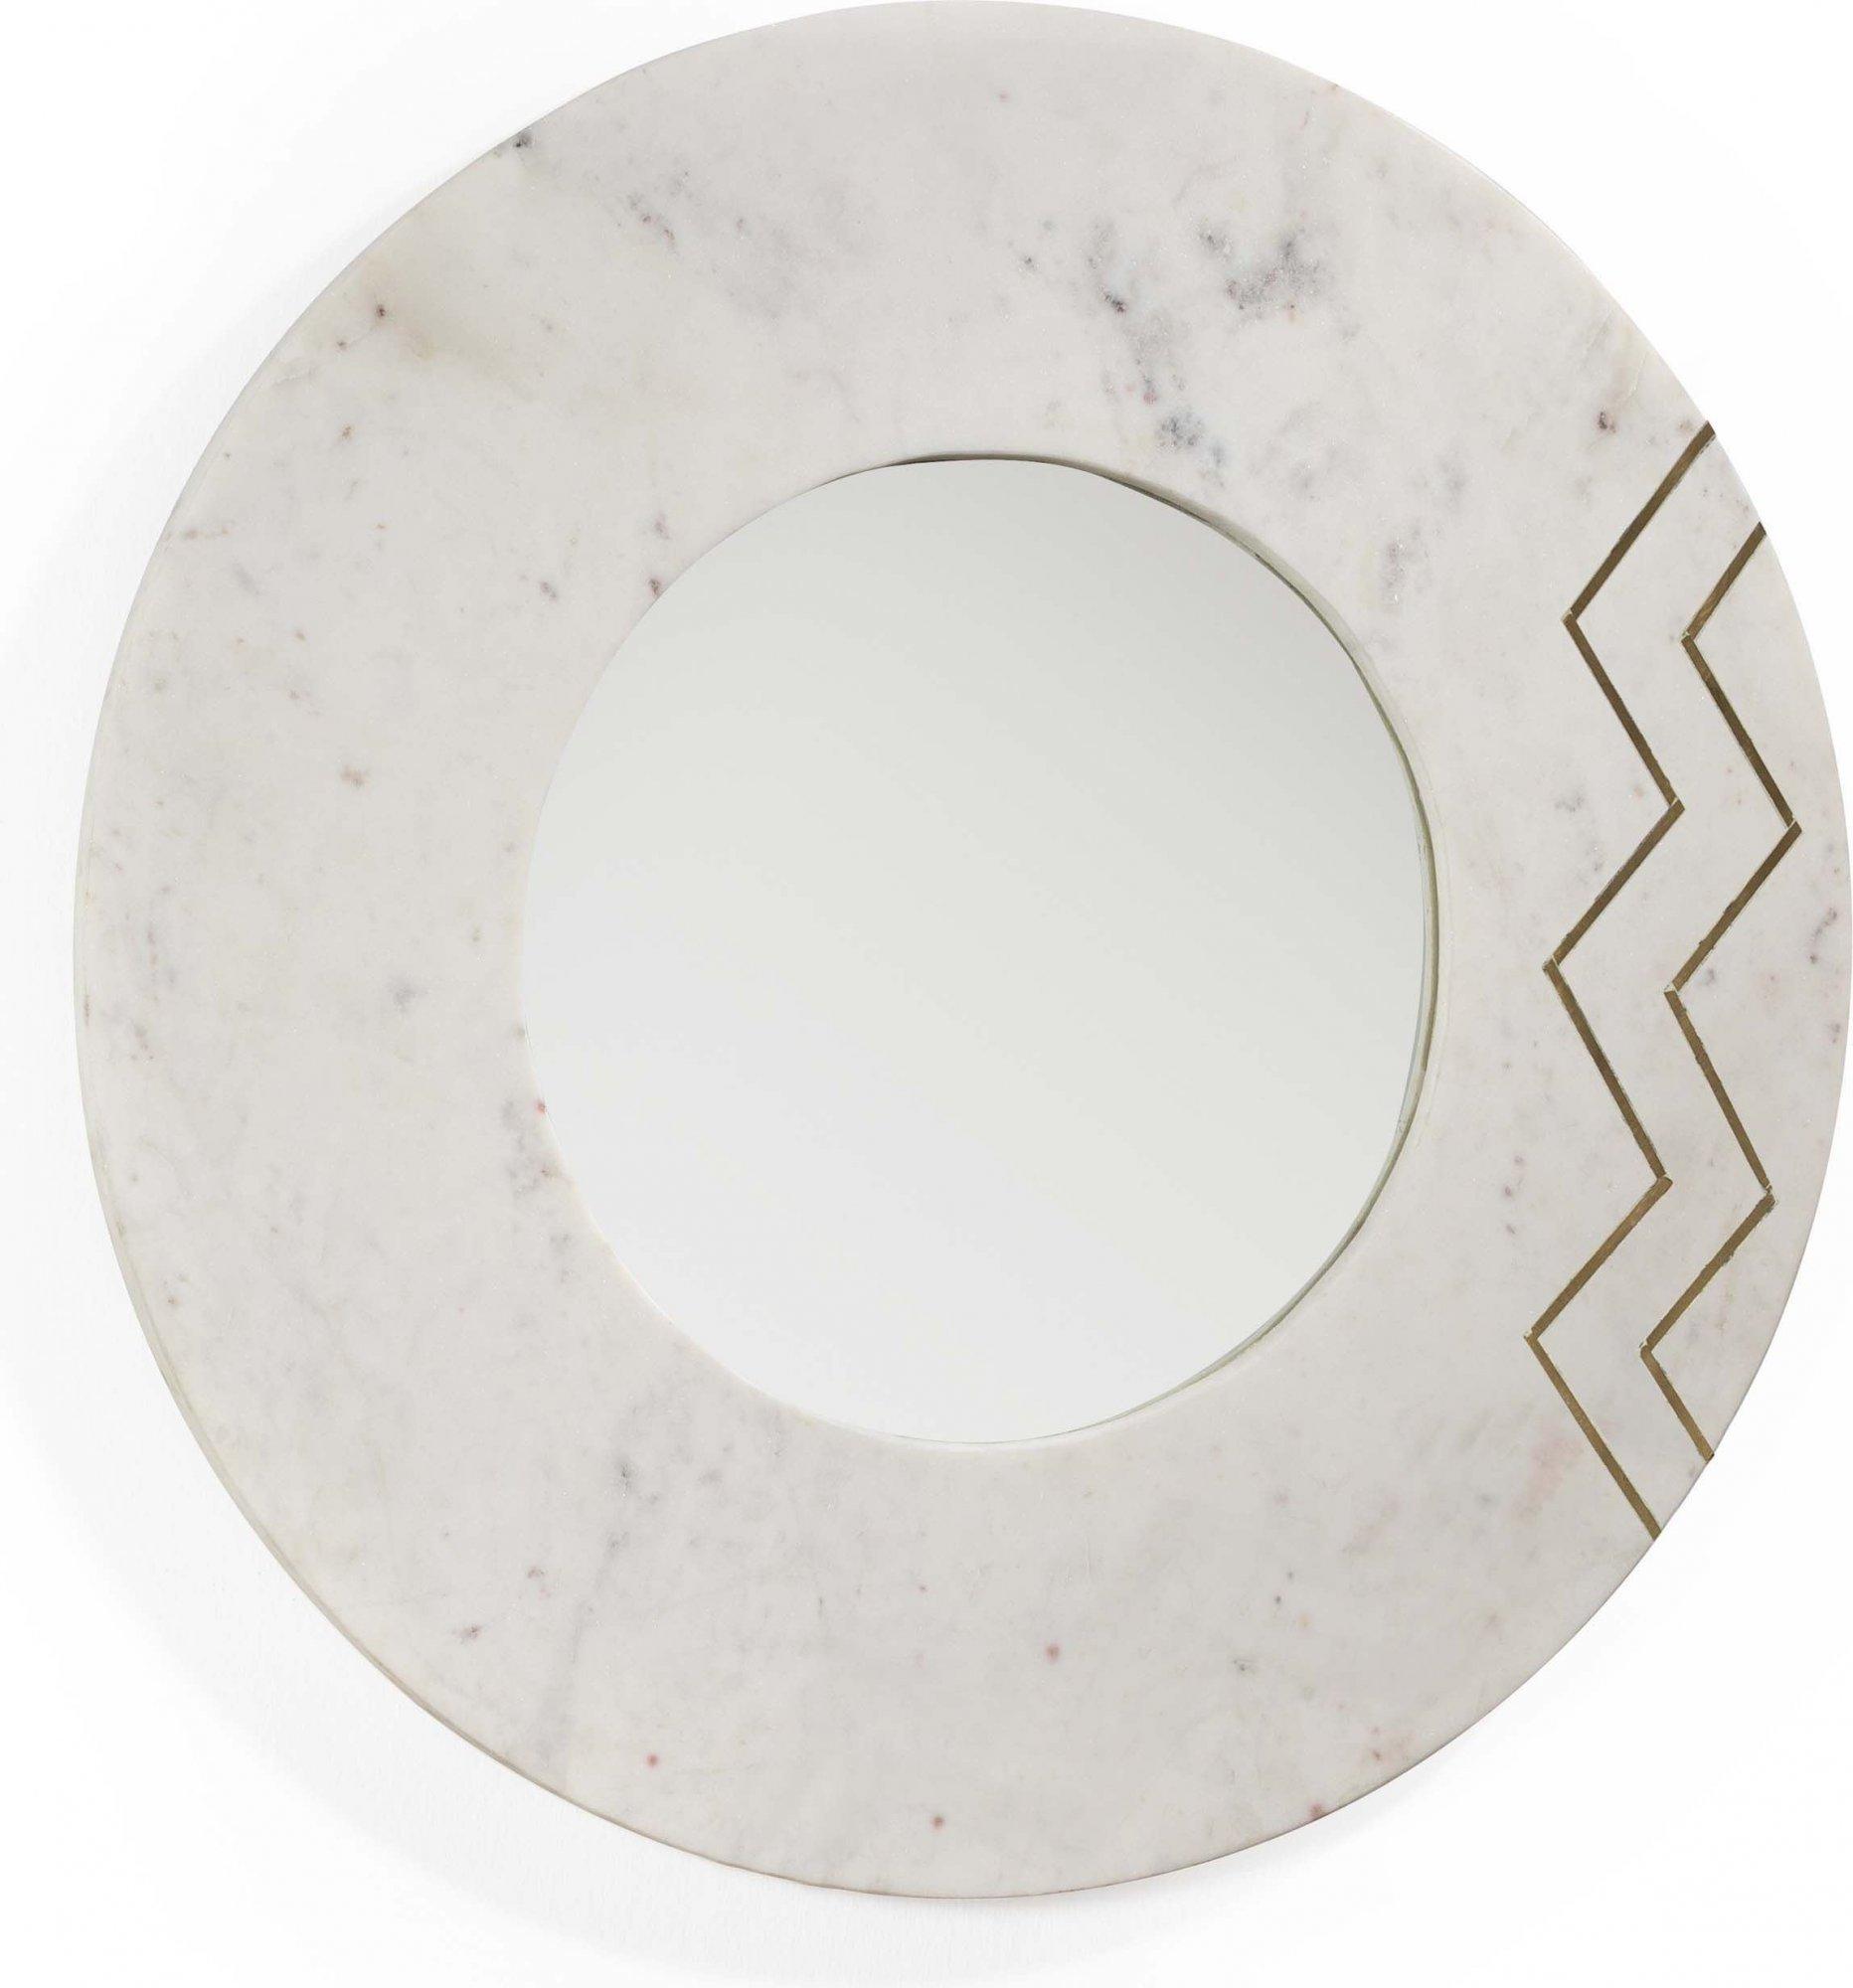 Miroir rond en marbre blanc d69